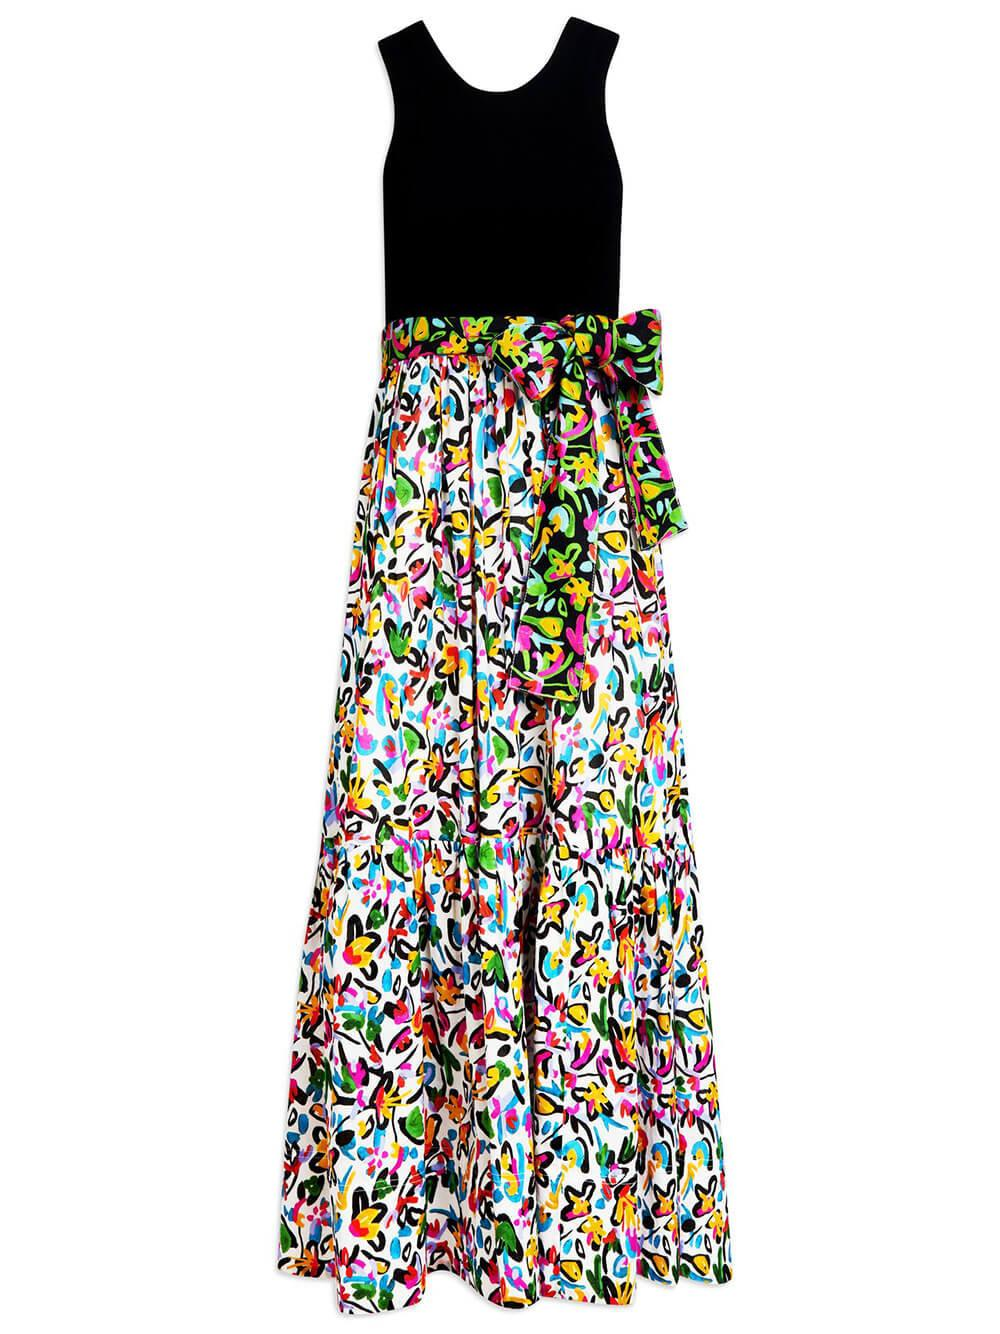 Genevive Painterly Printed Dress